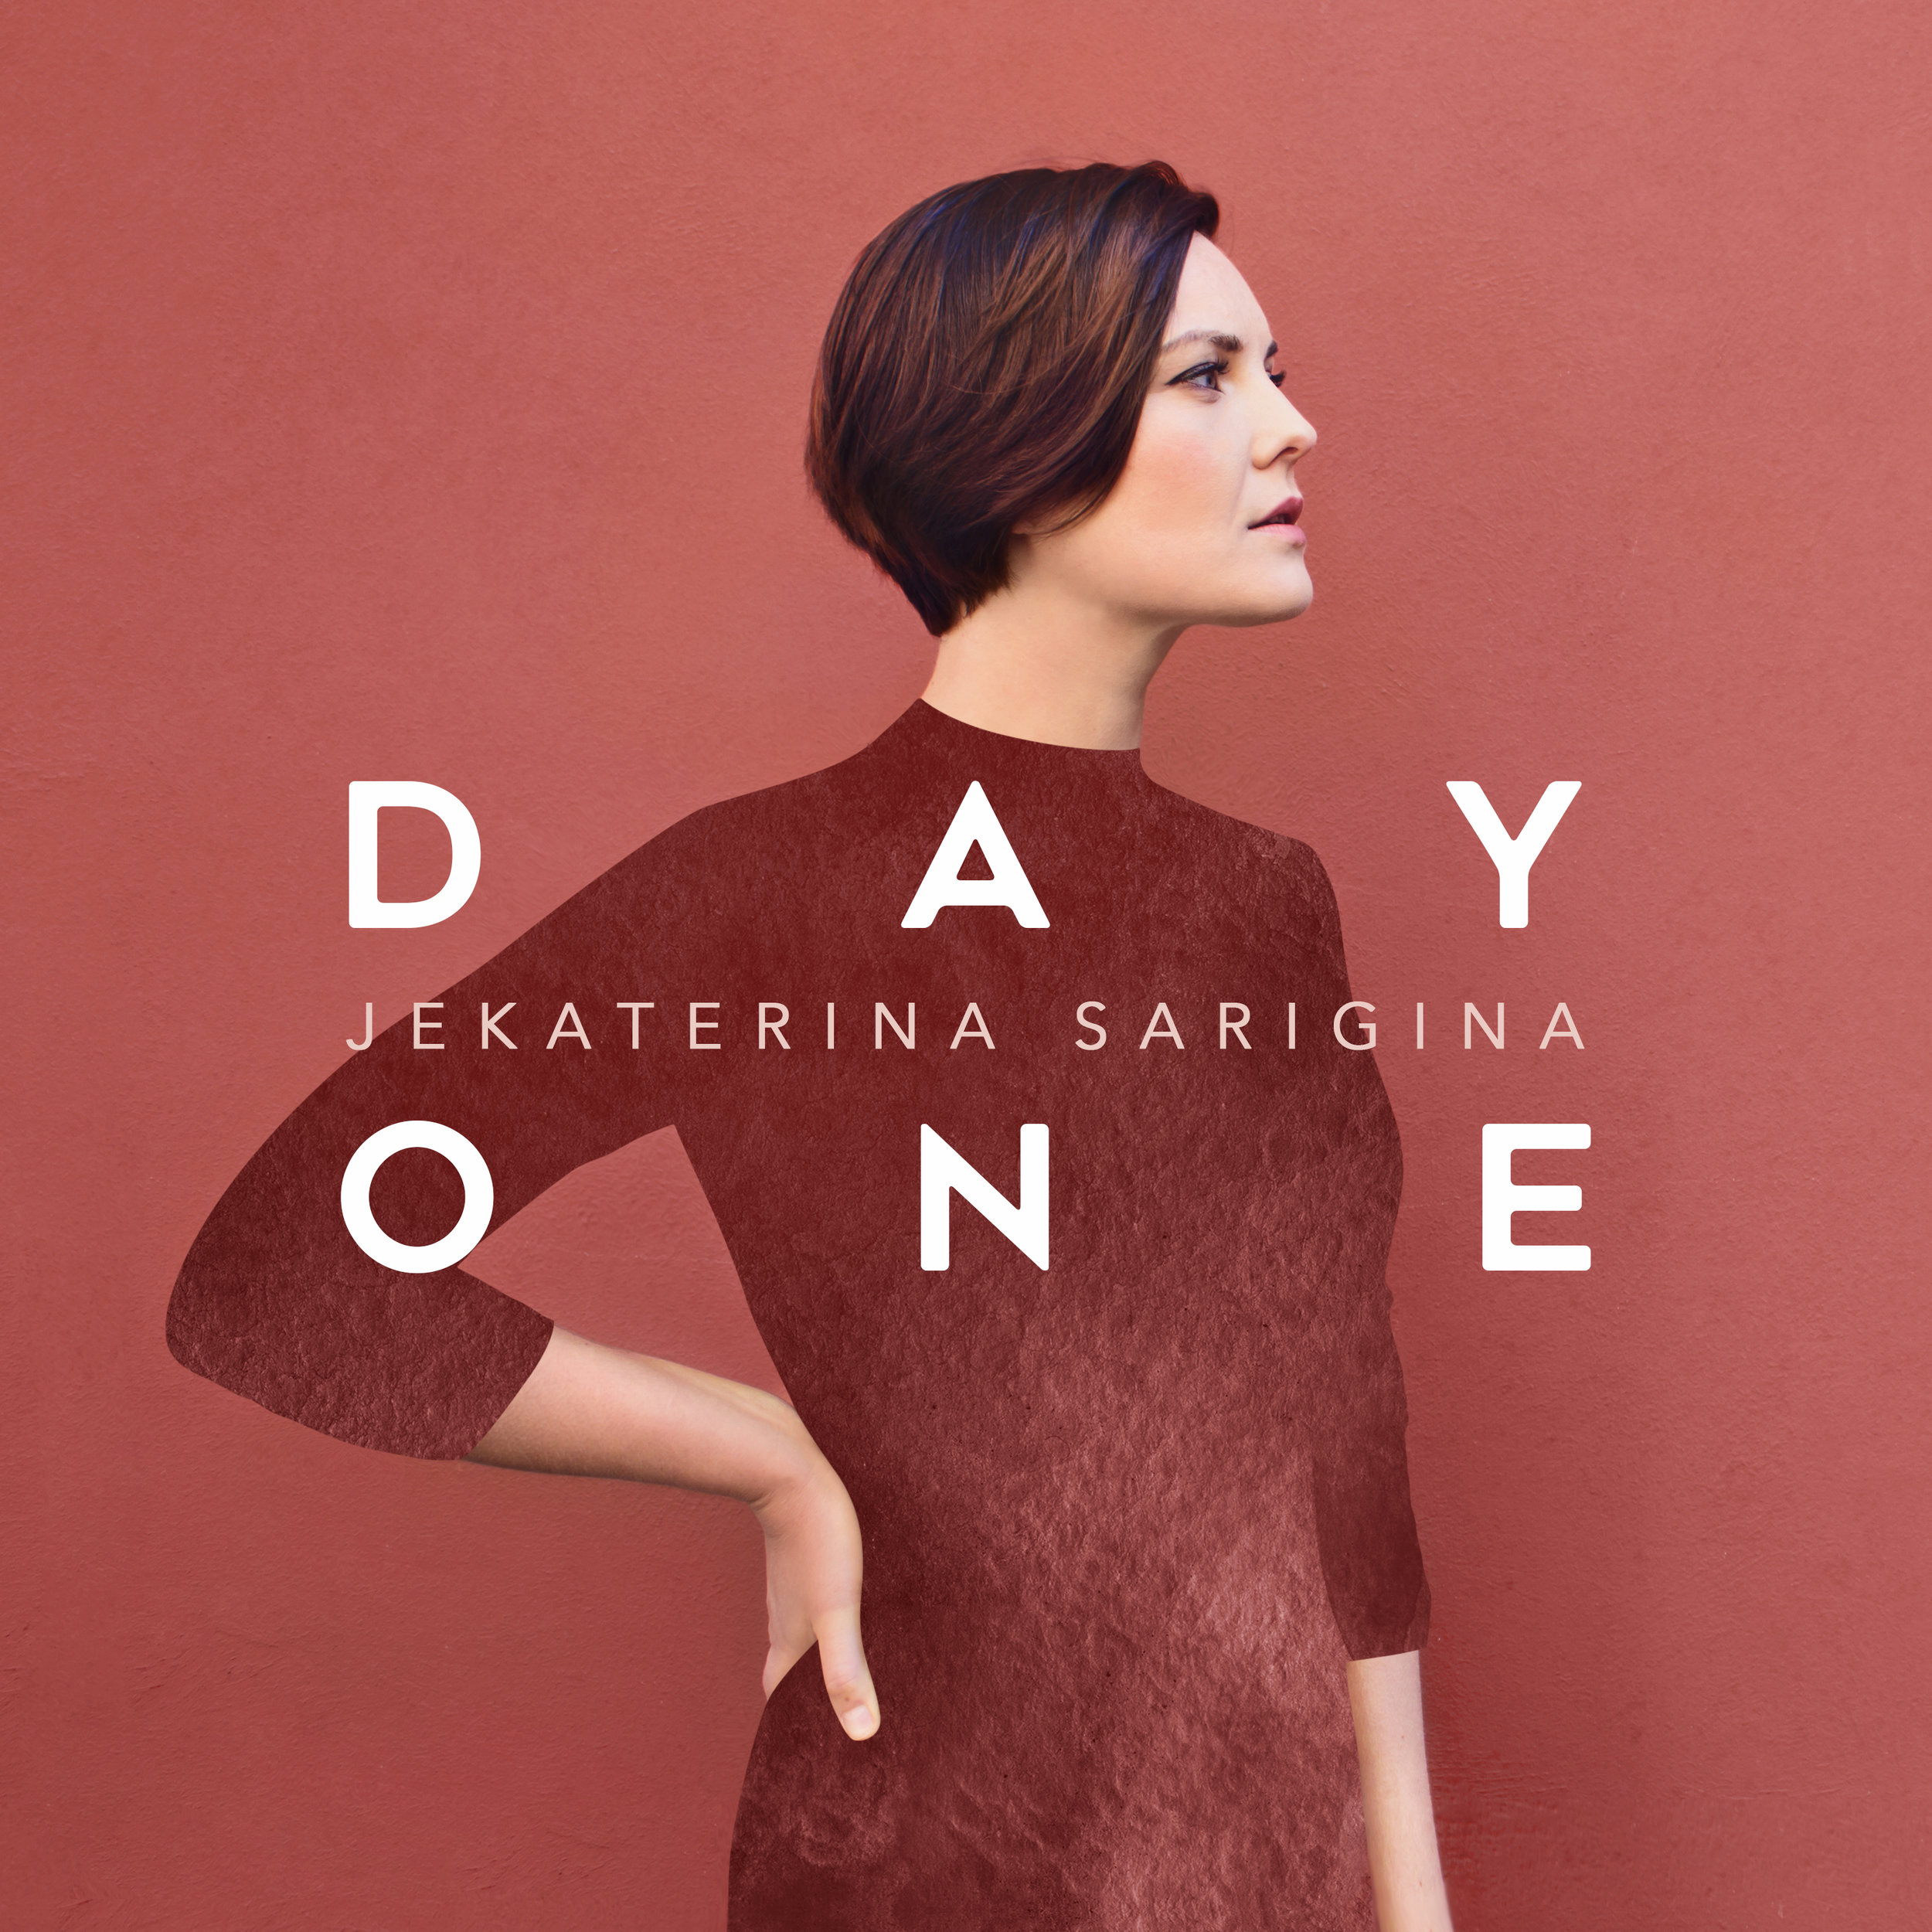 Jekaterina-Sarigina-Day-One-EP-Cover-3000x3000-5.jpg